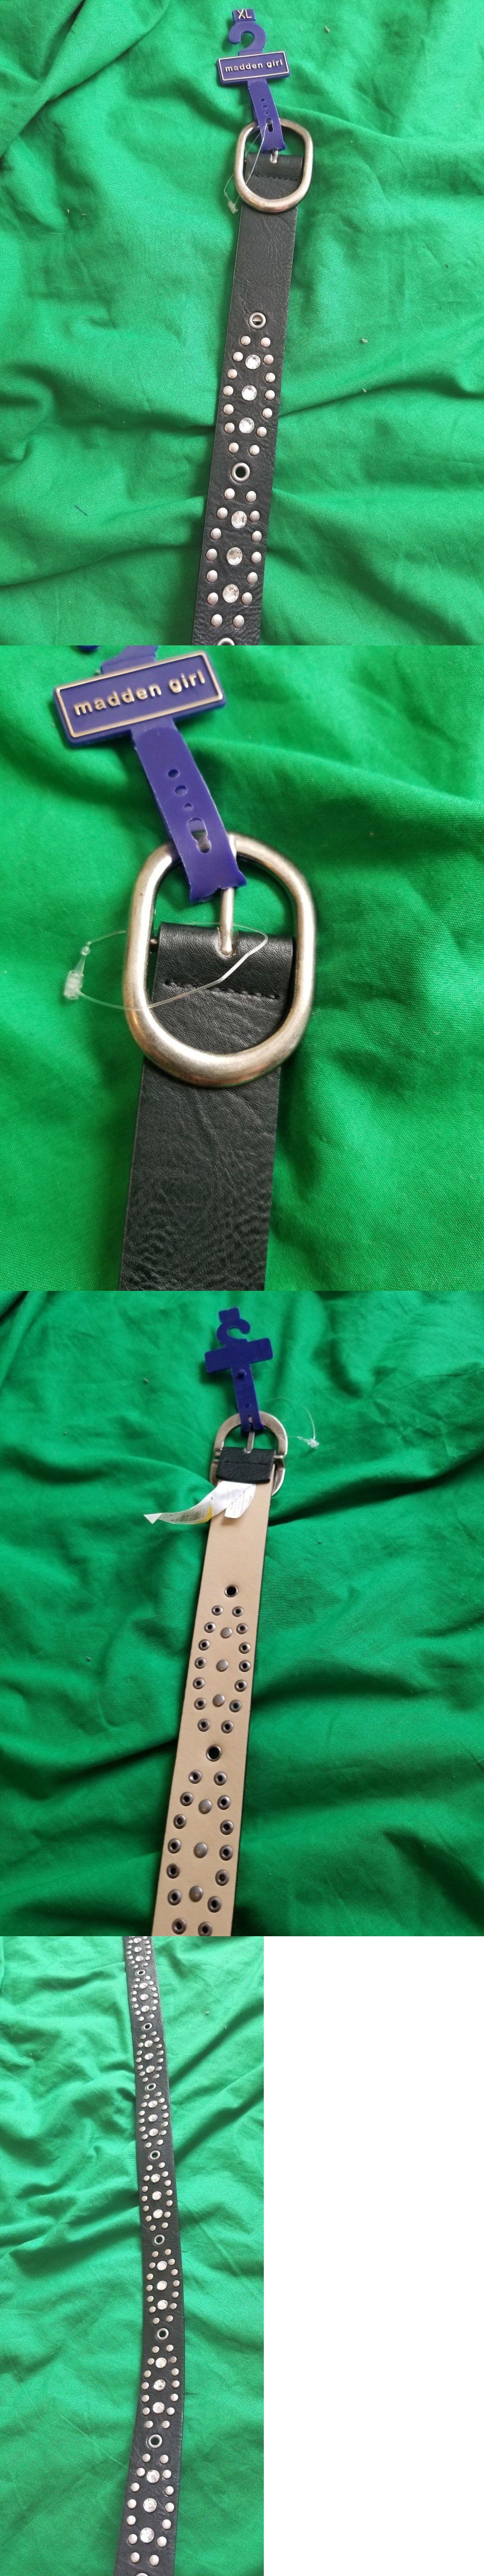 4fbd61f7b11 Belts 3003  Madden Girl Women S Belt Nwt Size Xl Black Studded Embellished  Synthetic Narrow